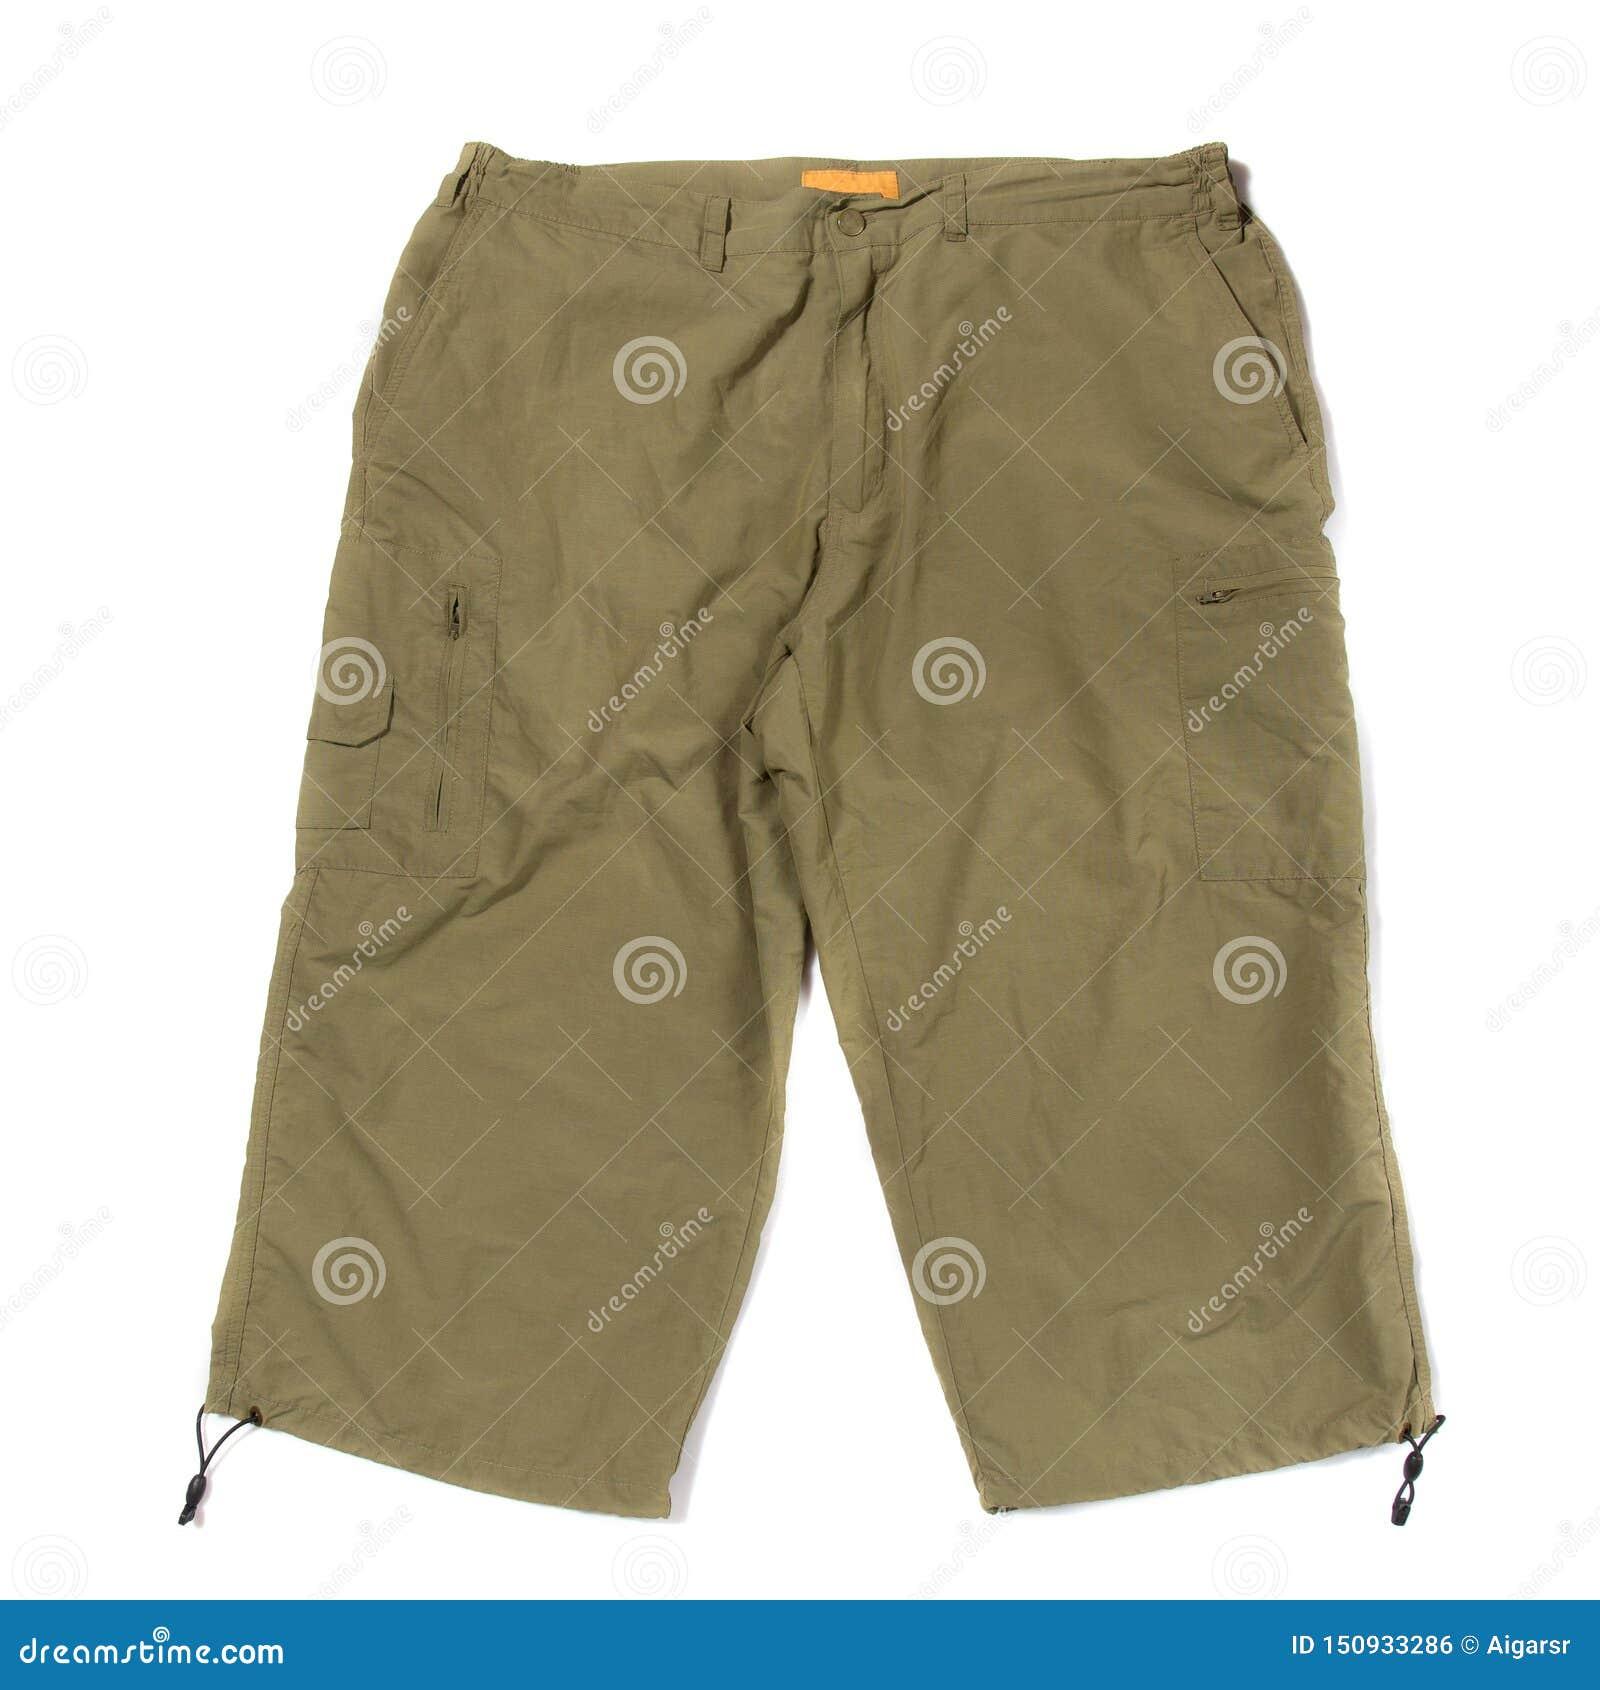 Pantalones cortos que caminan verdes